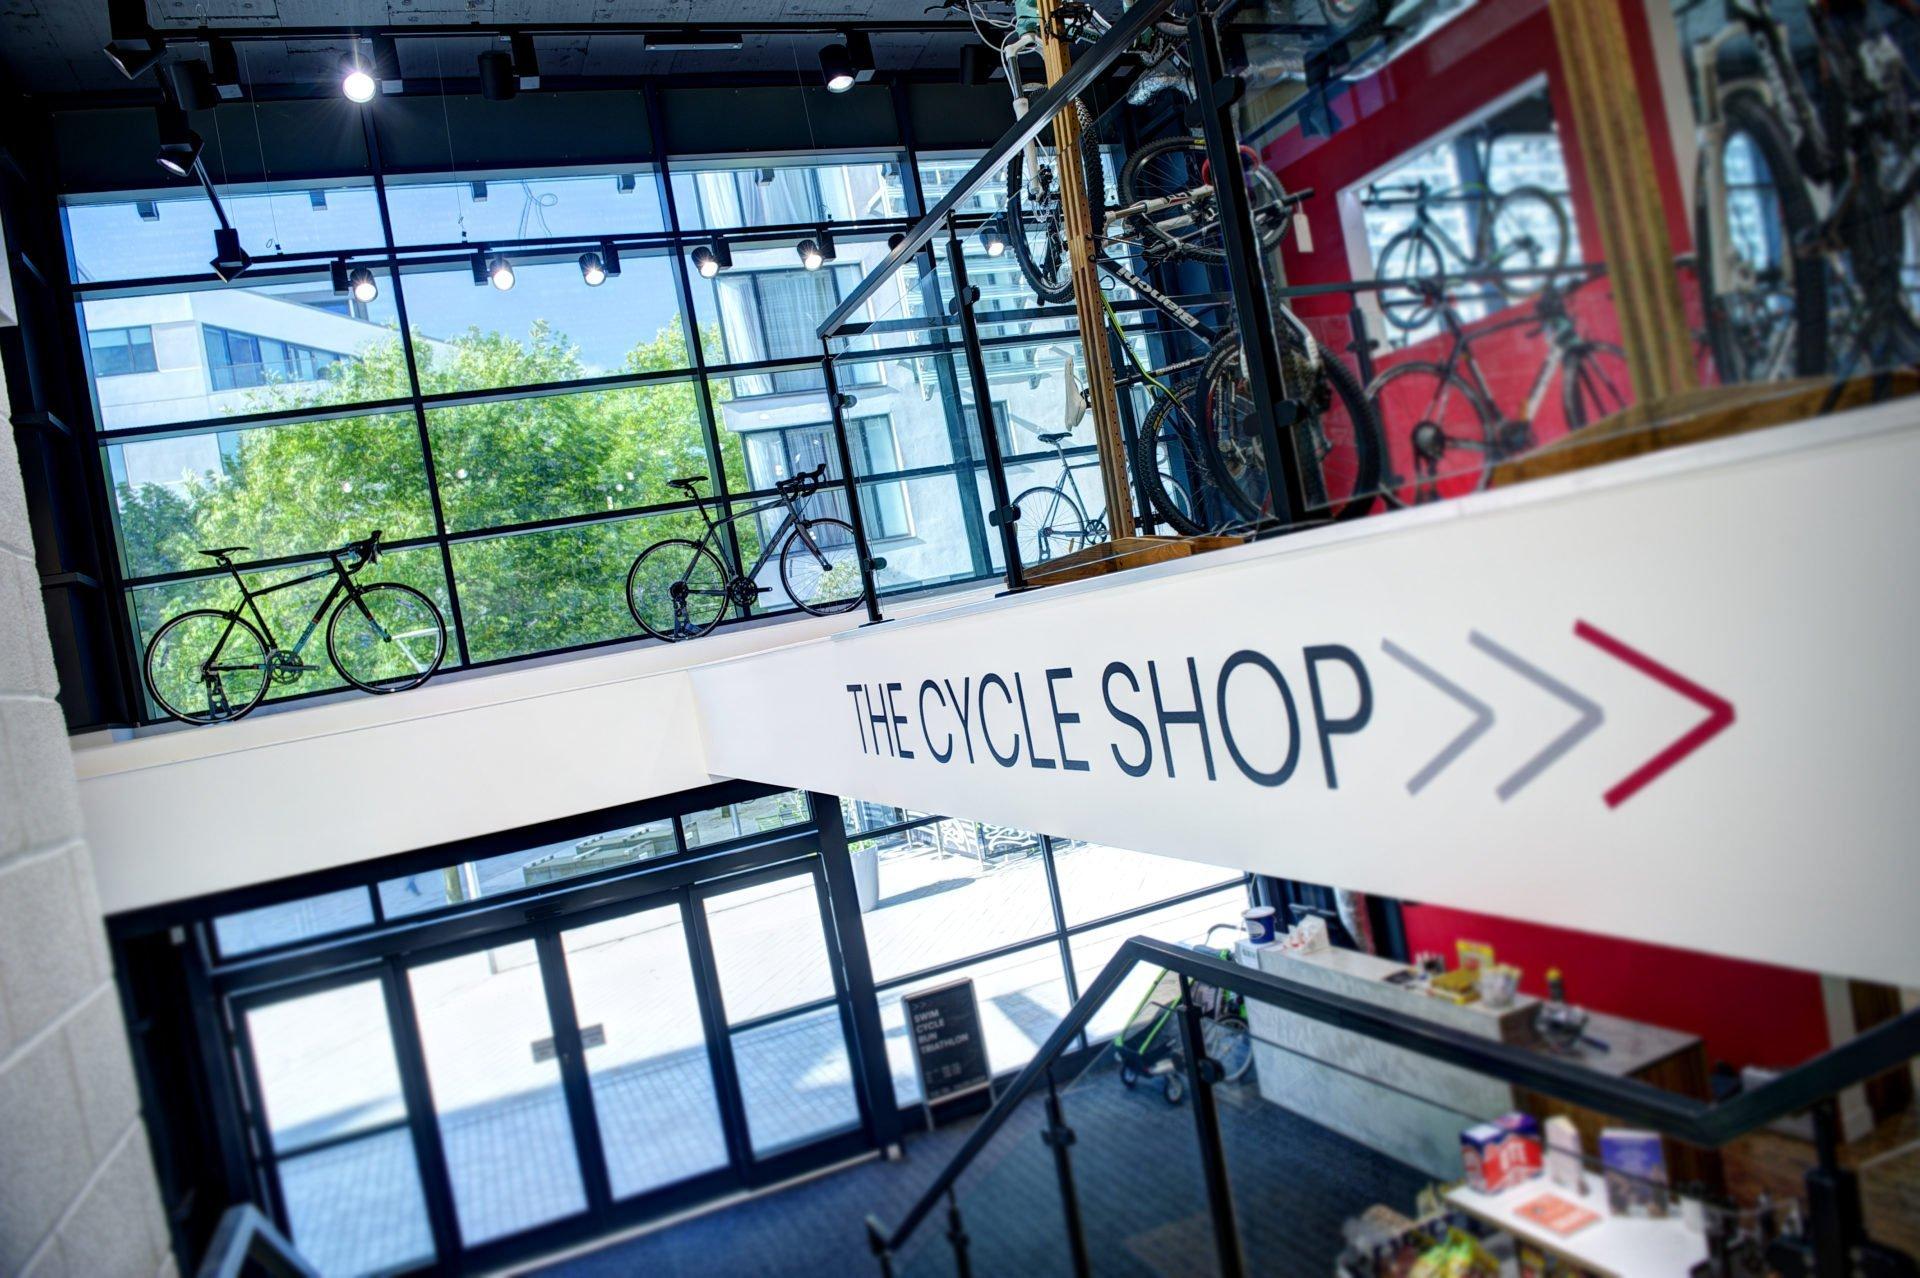 the-bike-shop-uk-see-through-window-graphics